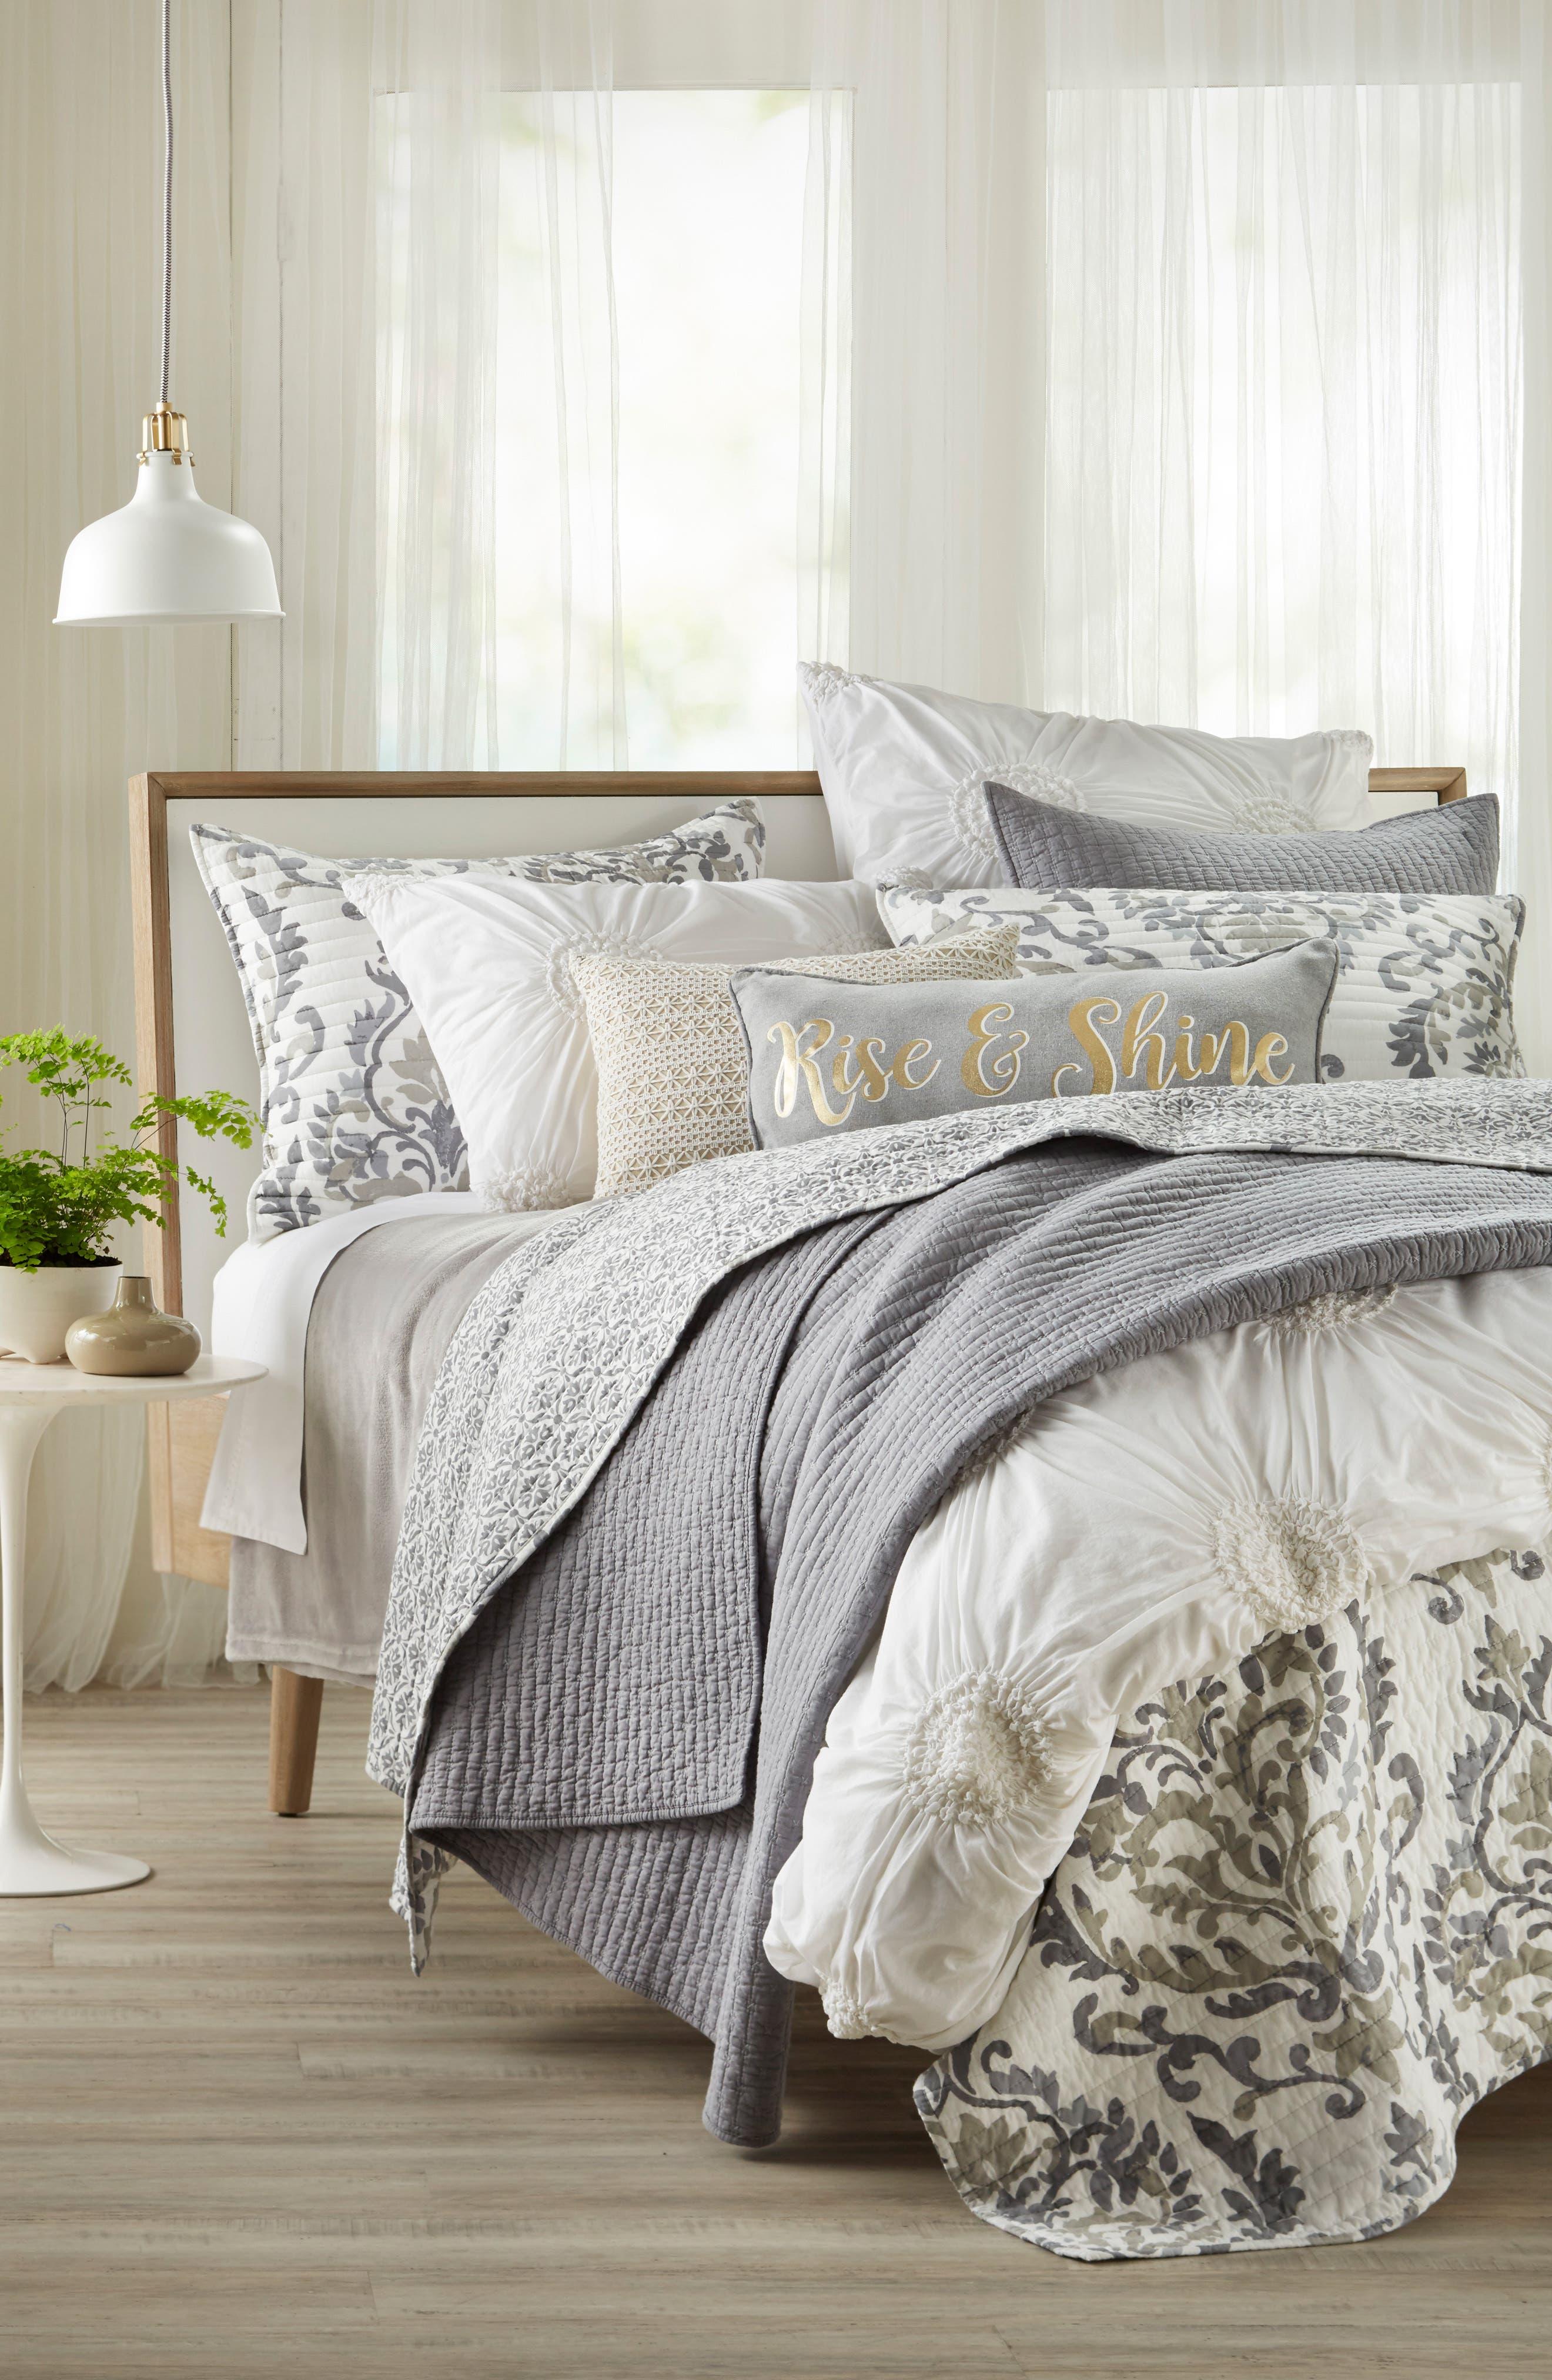 Arden Rise & Shine Accent Pillow,                             Alternate thumbnail 2, color,                             Grey